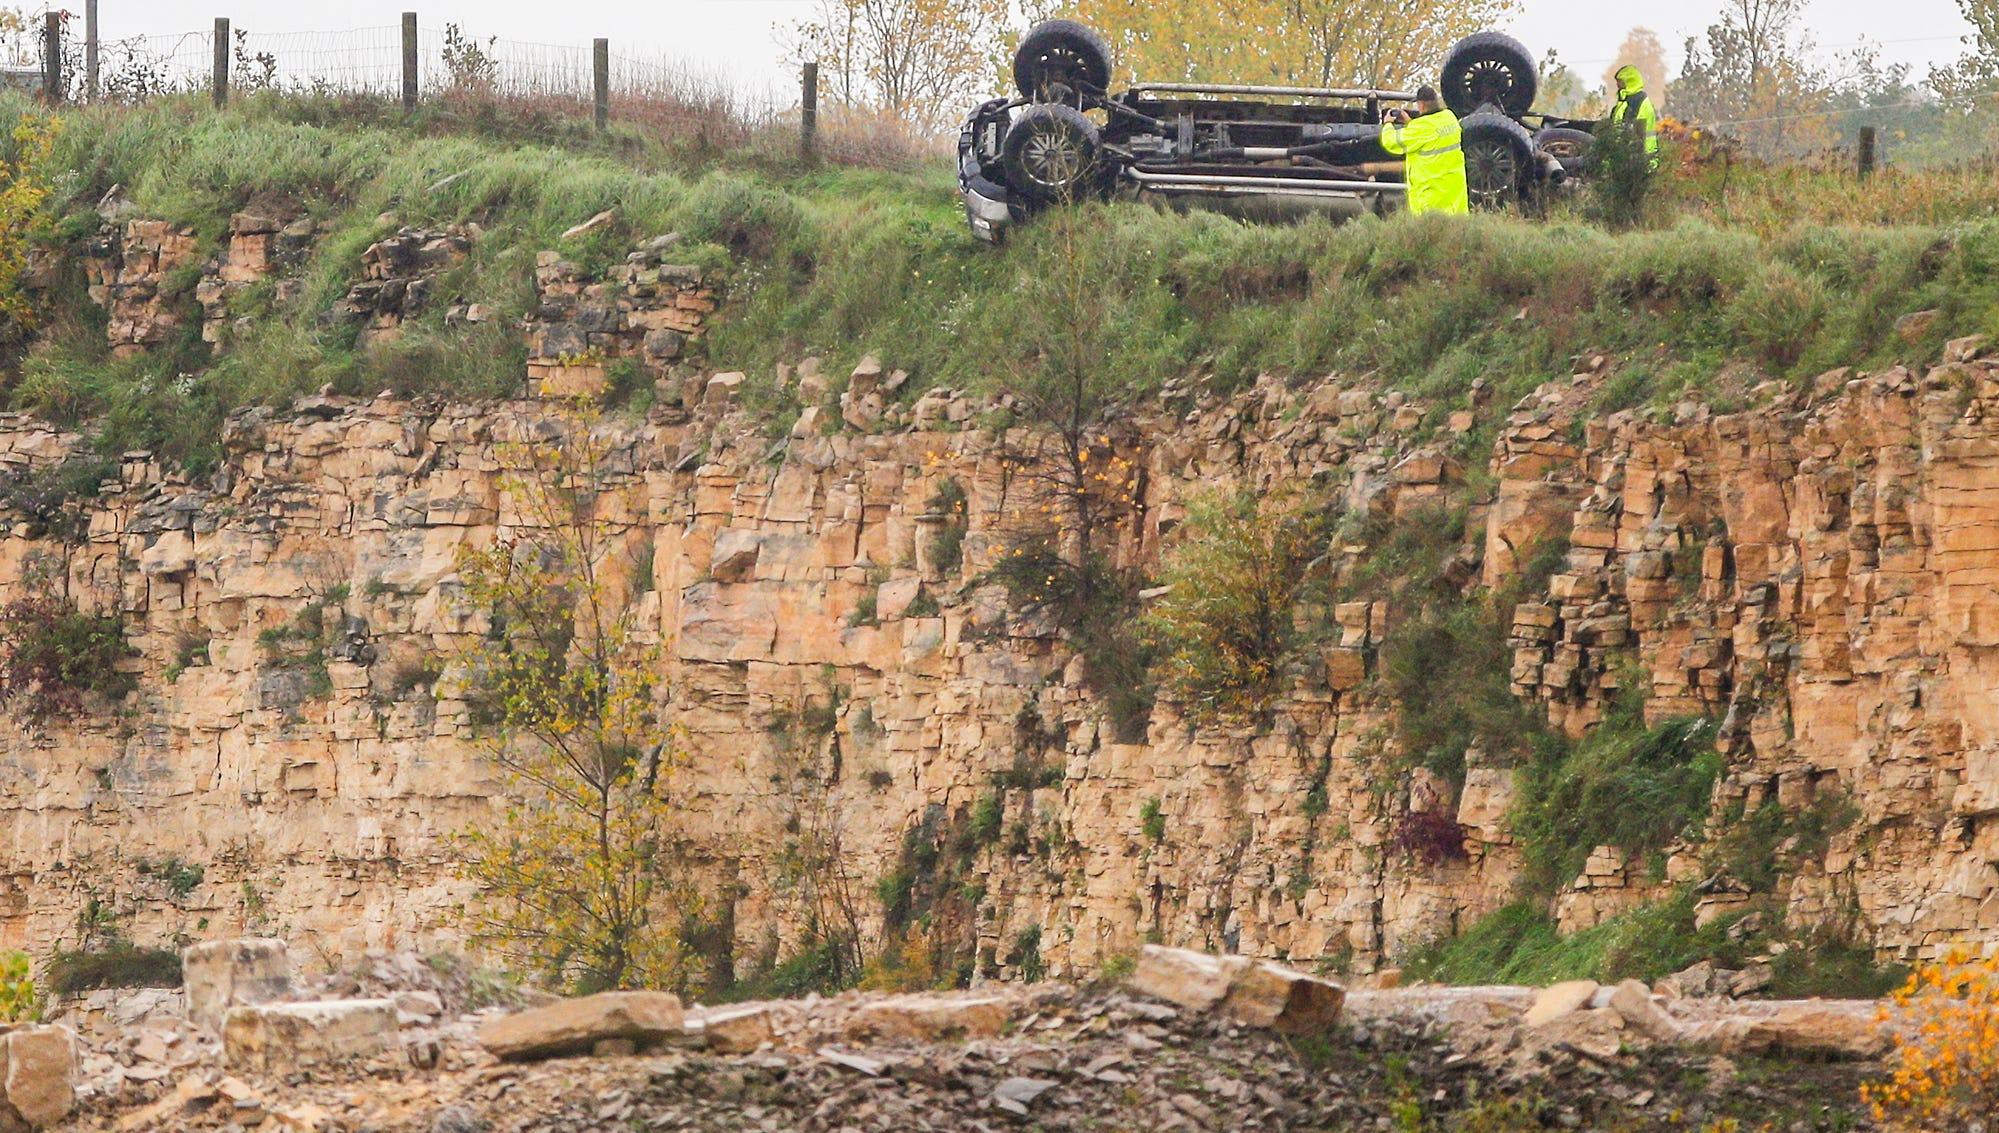 Driver killed along Interstate 41 in rollover crash near Eden, Byron exit